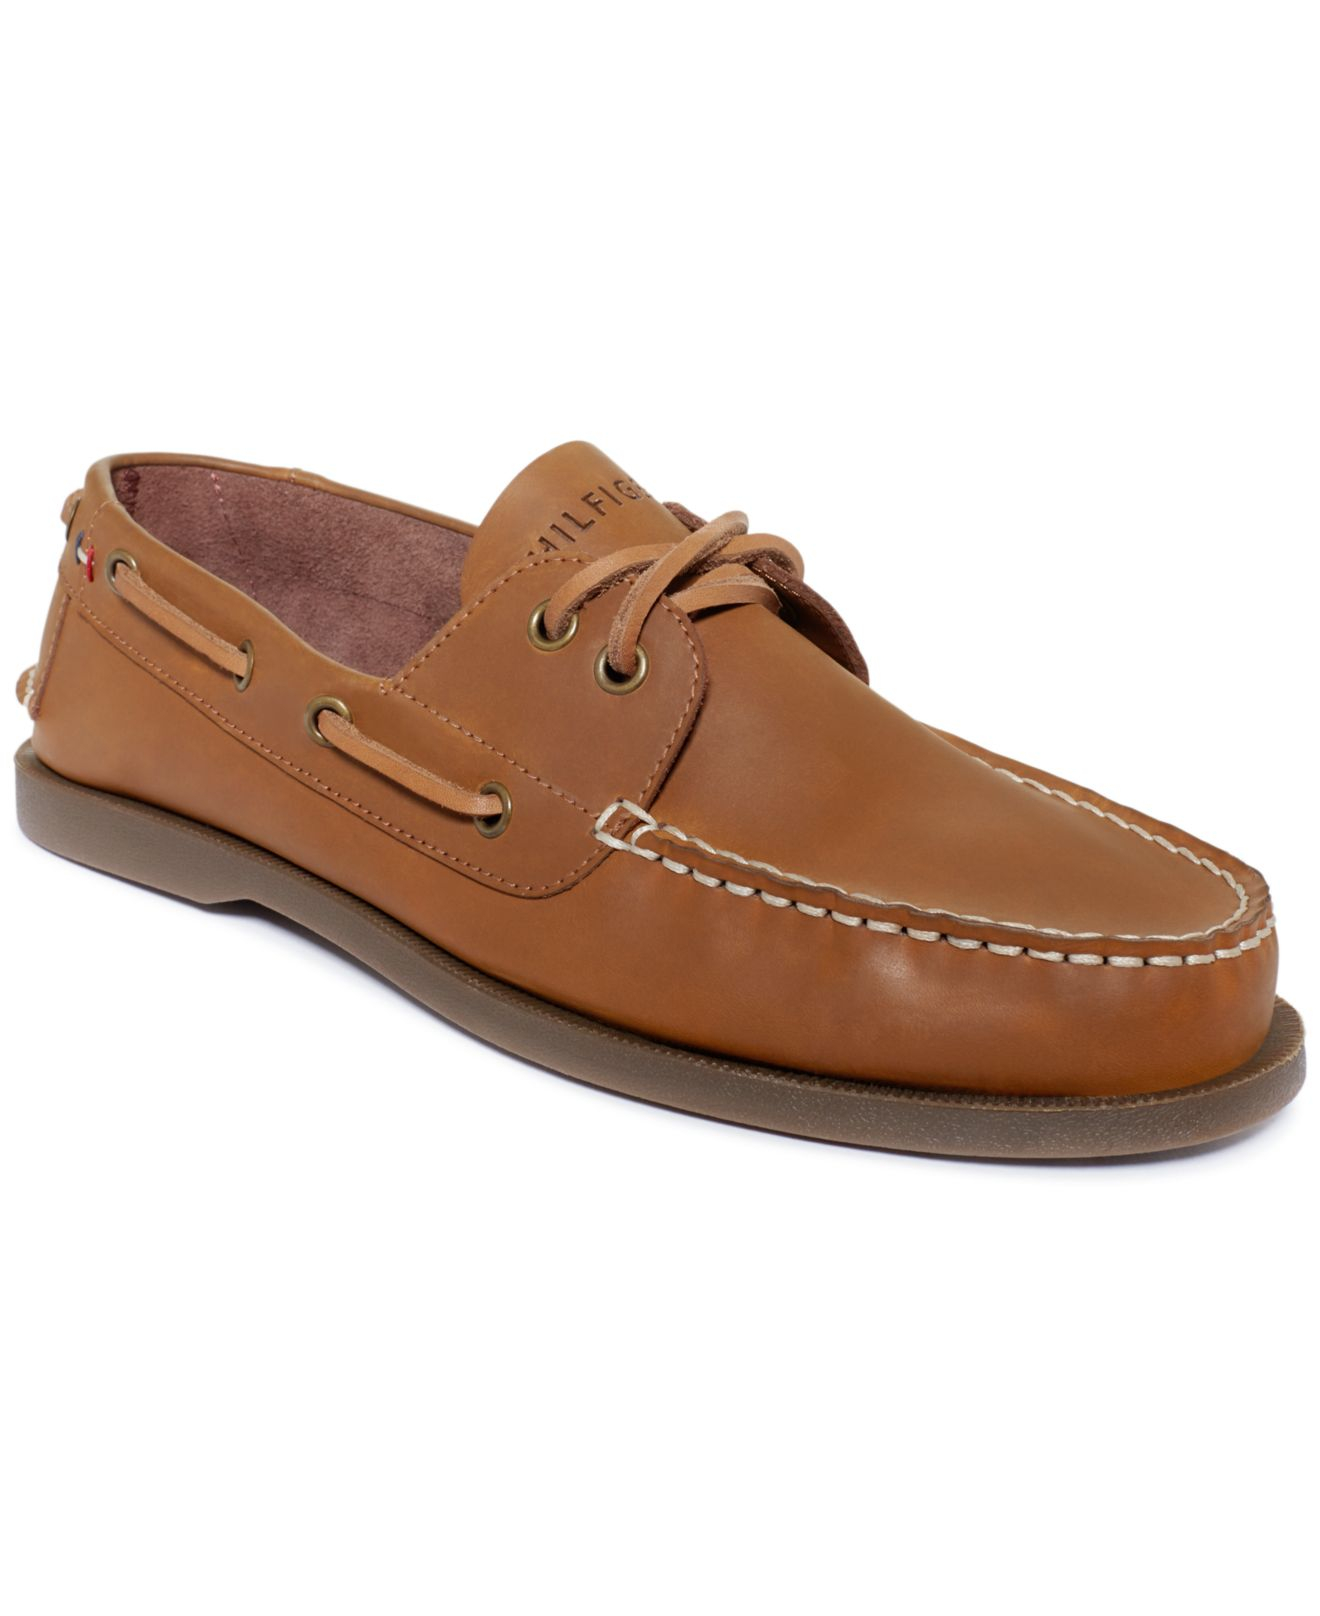 Tommy Hilfiger Boat Shoes Brown